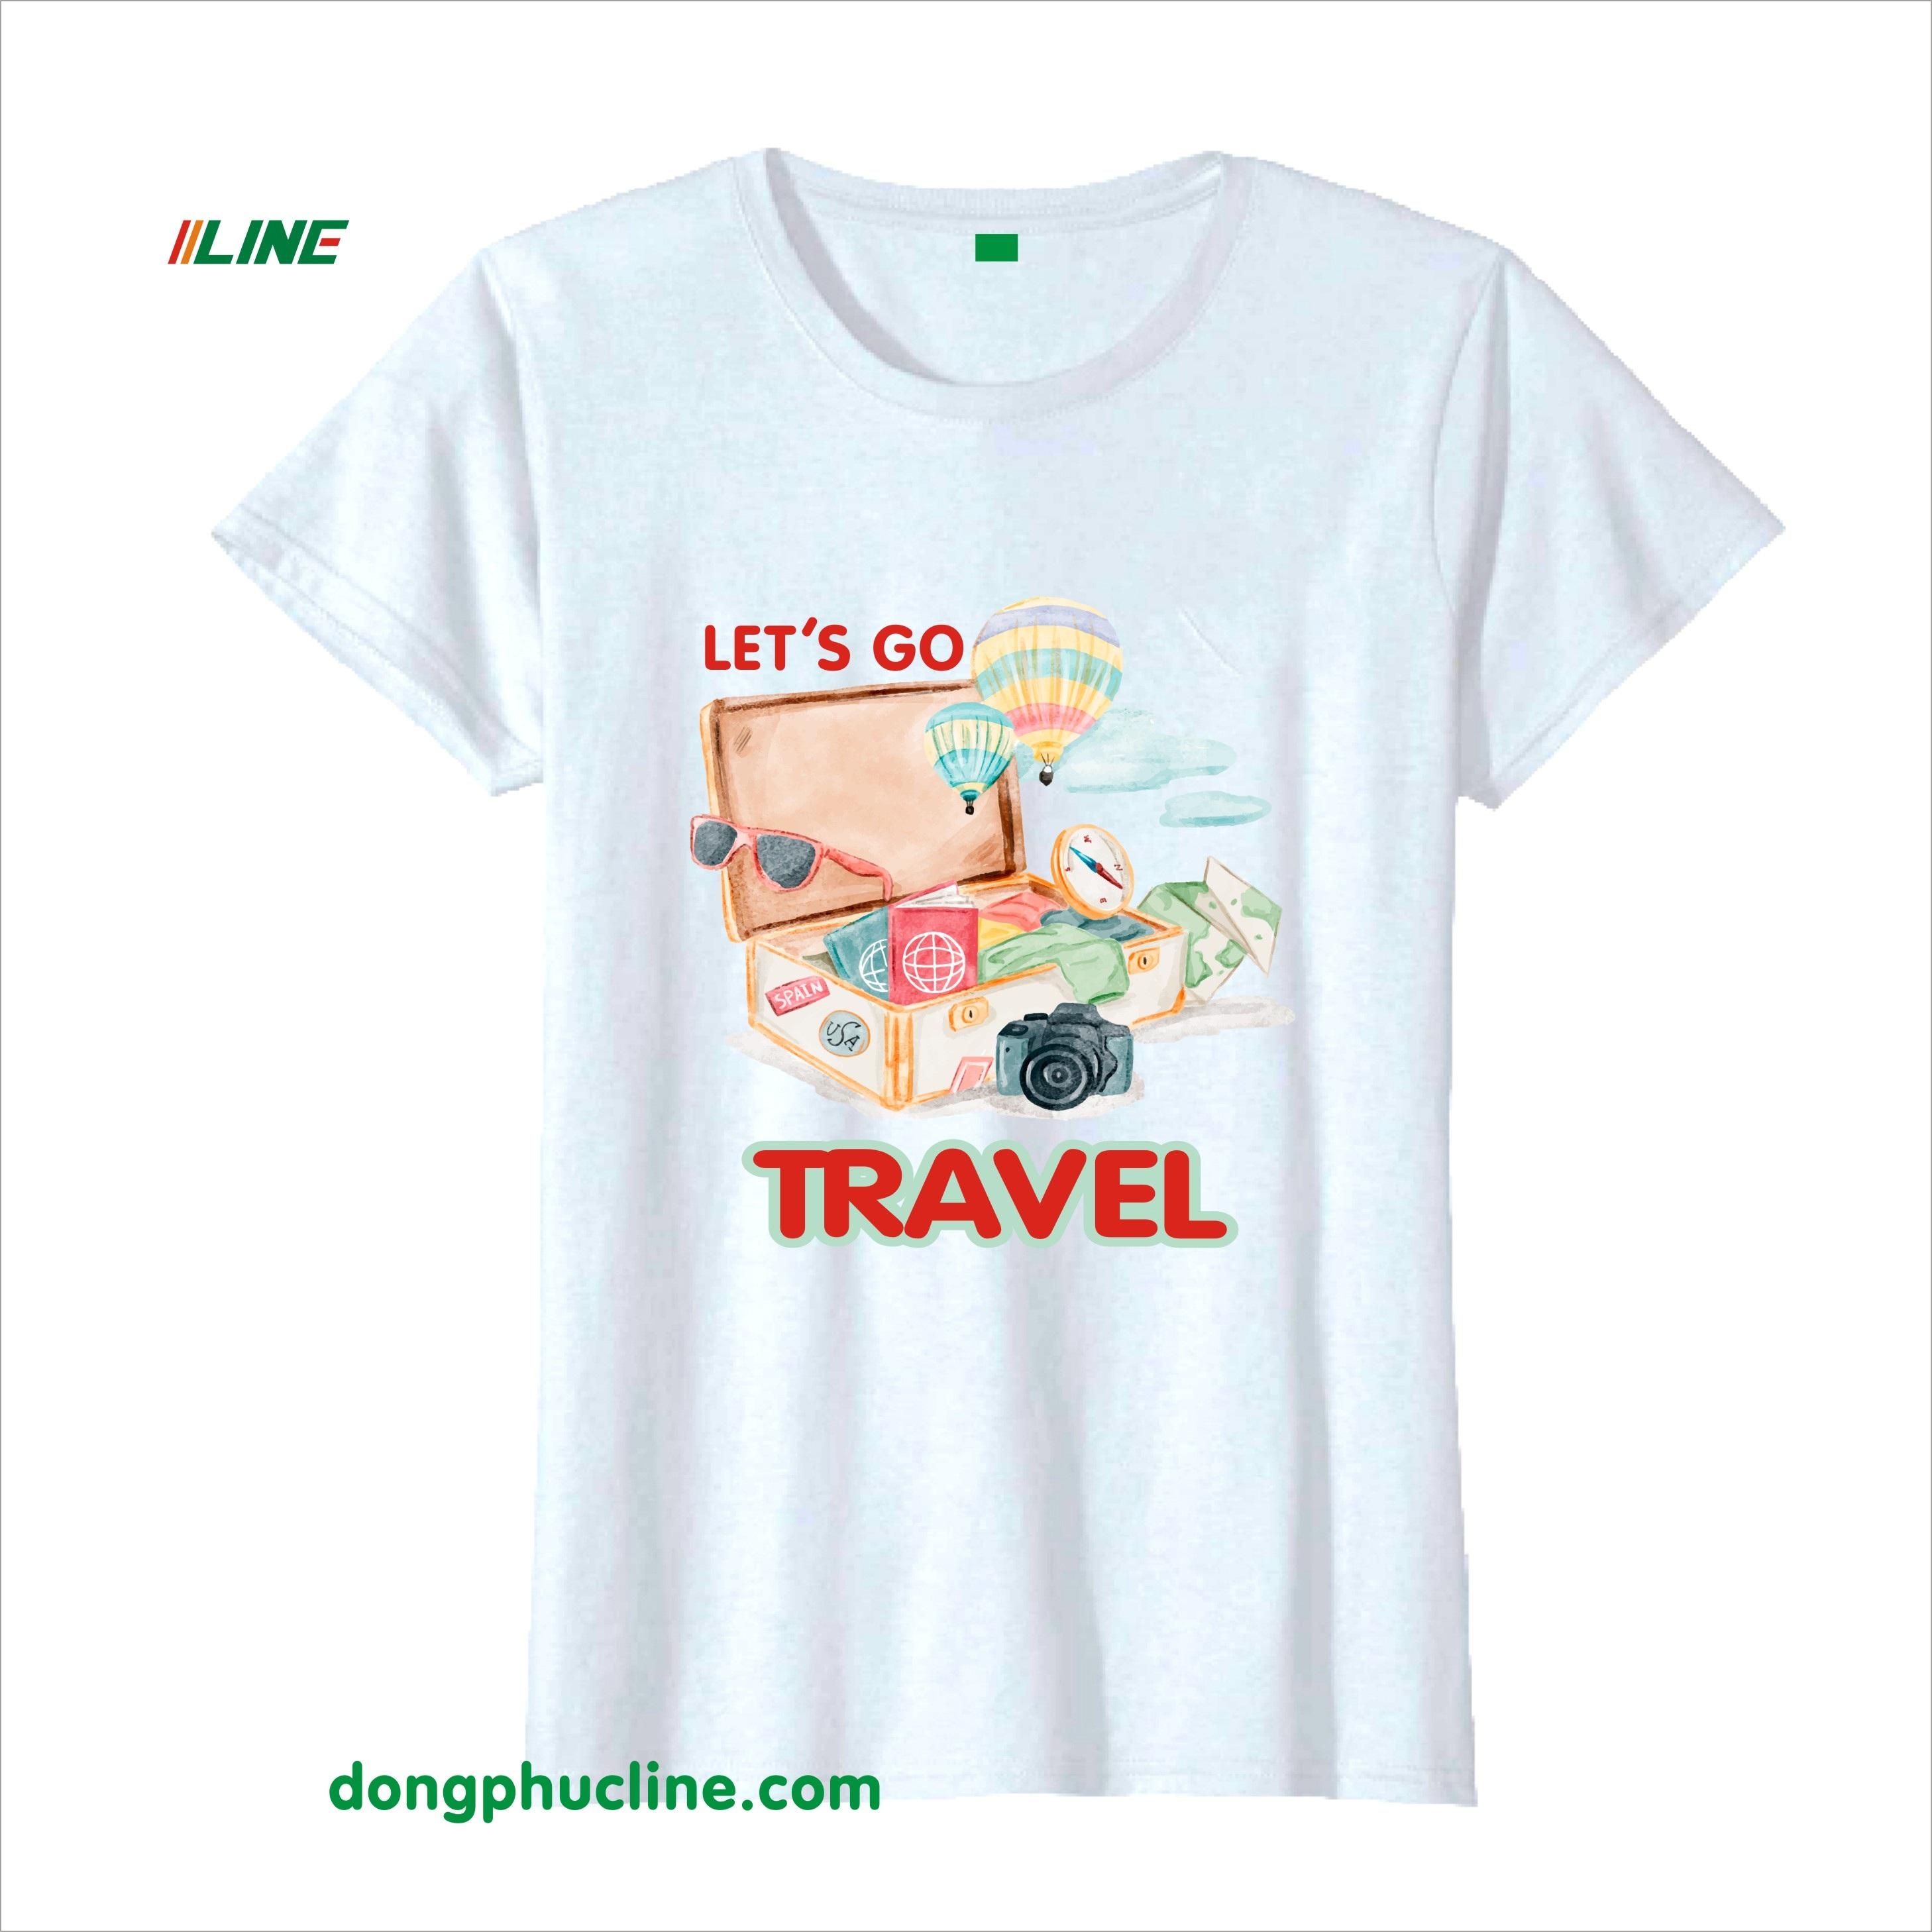 áo let's go travel 2